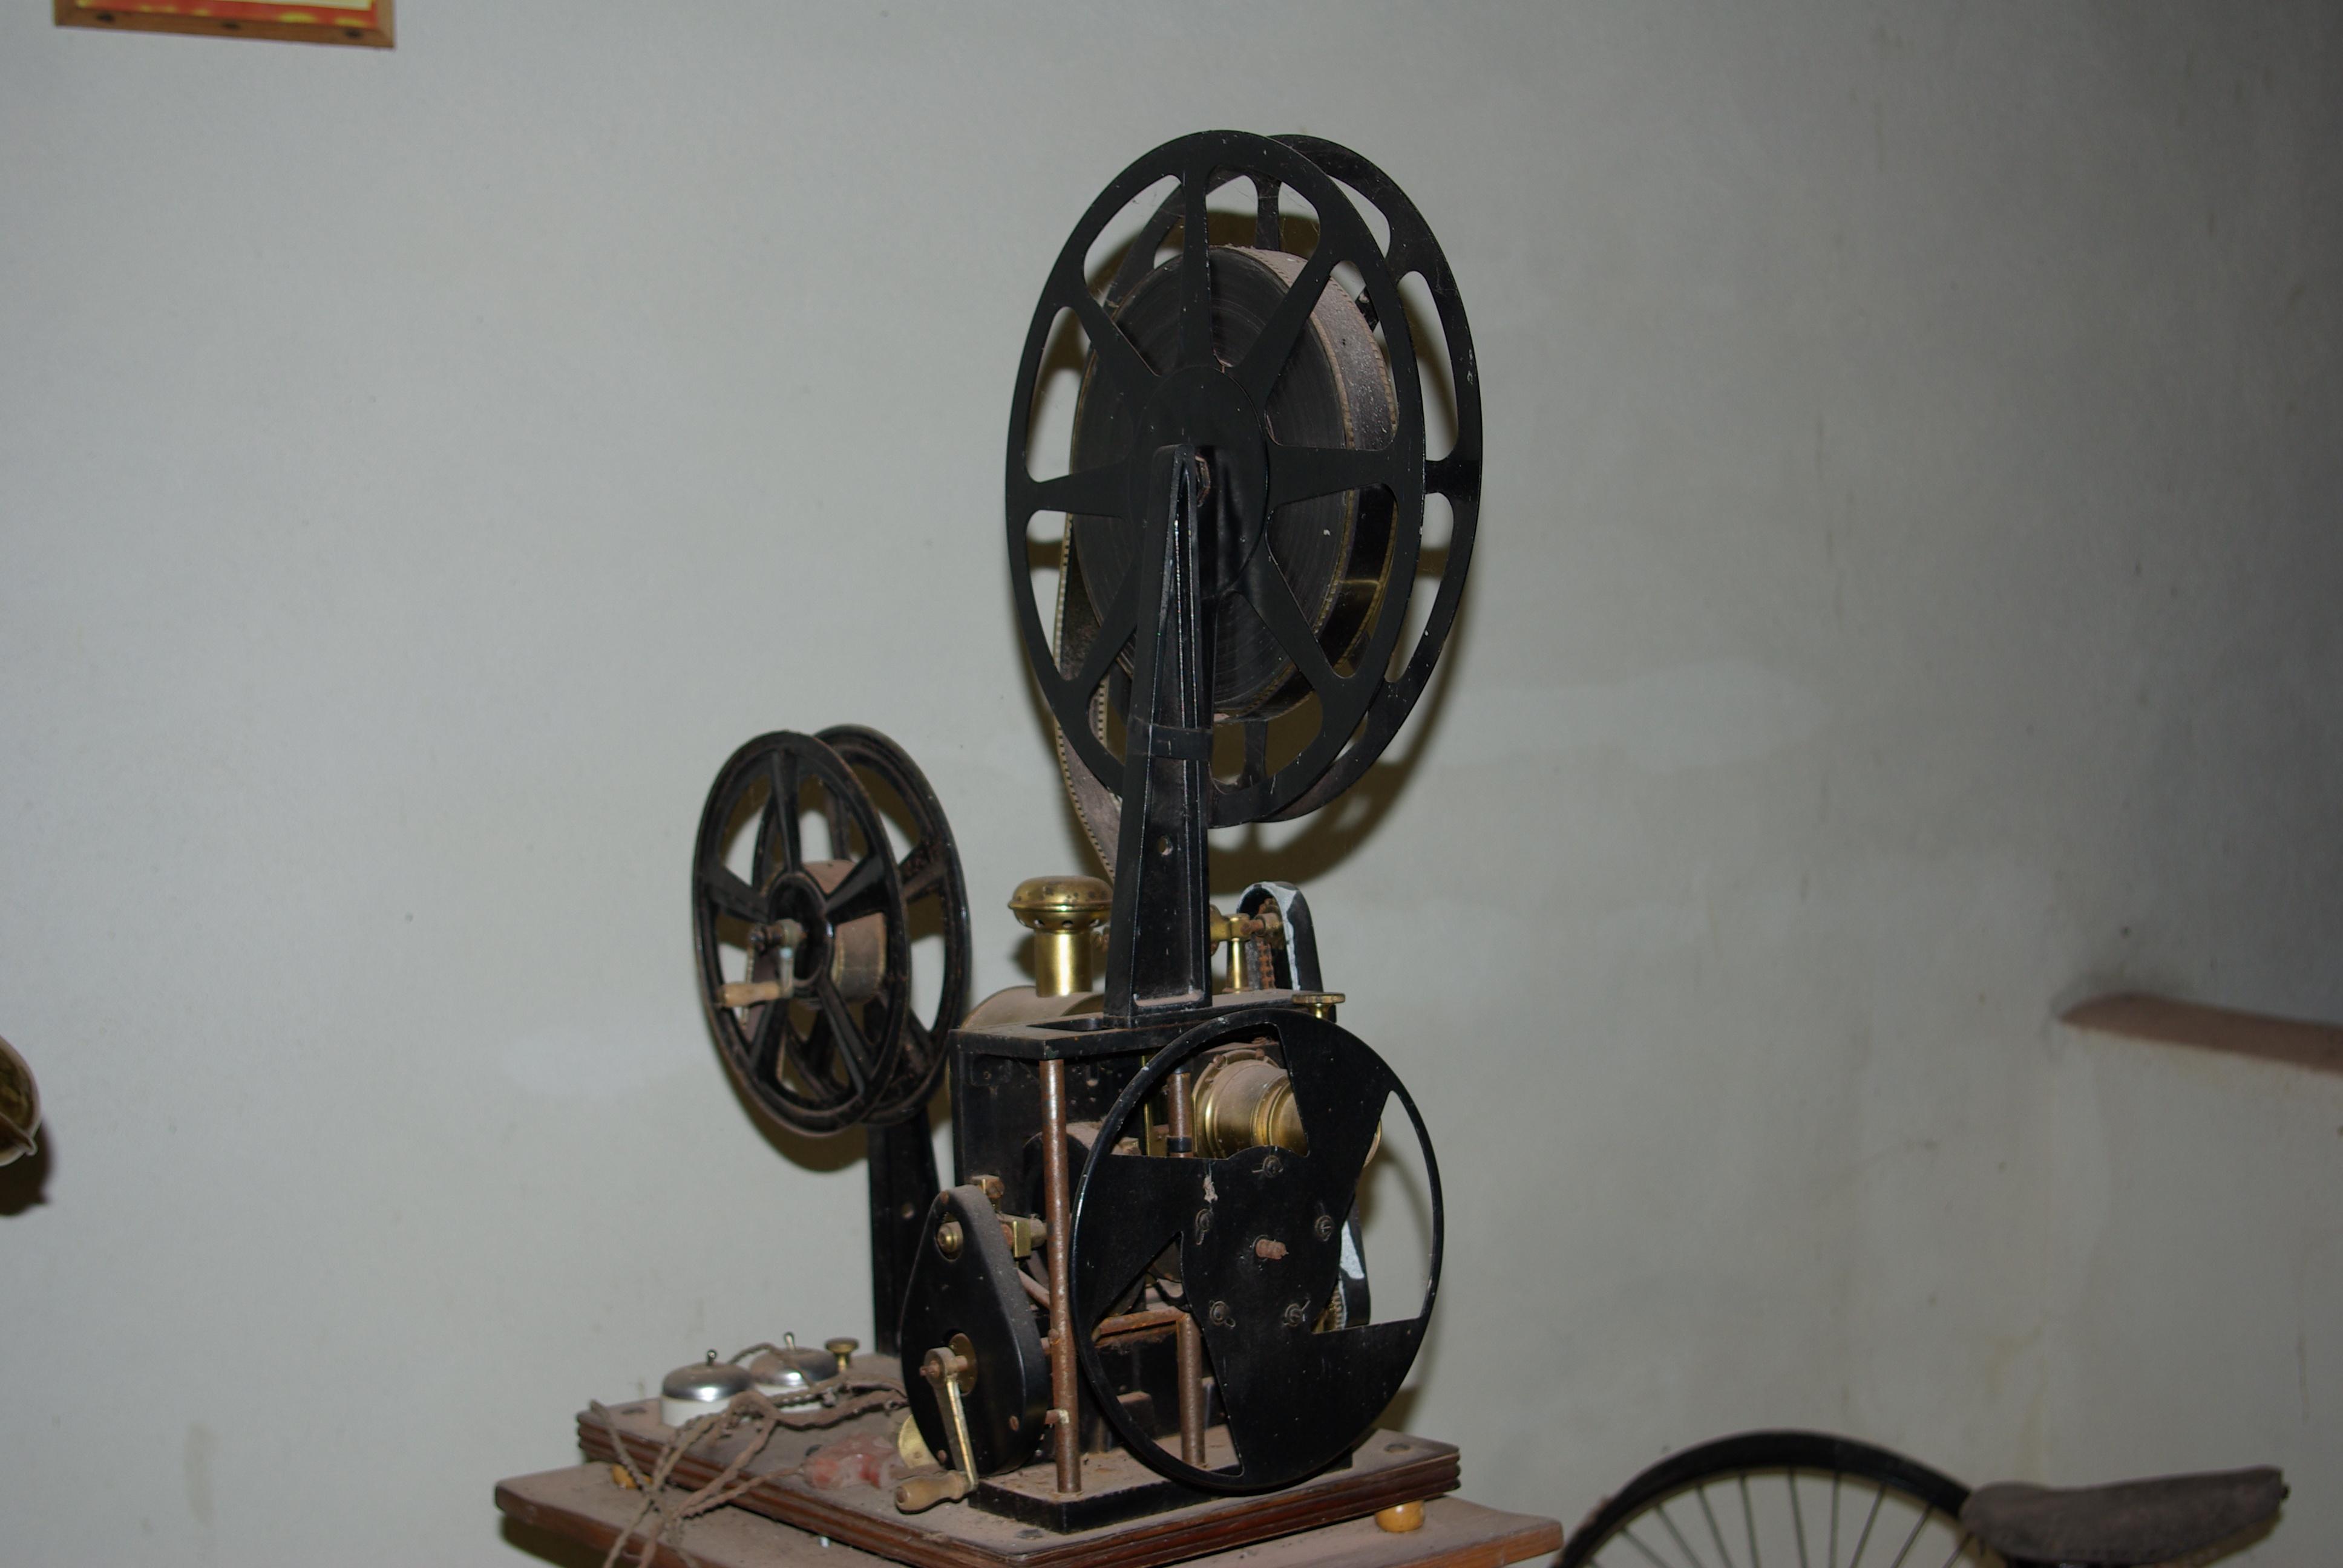 1910_Film_projector_path%C3%A9-fr%C3%A8res.jpg